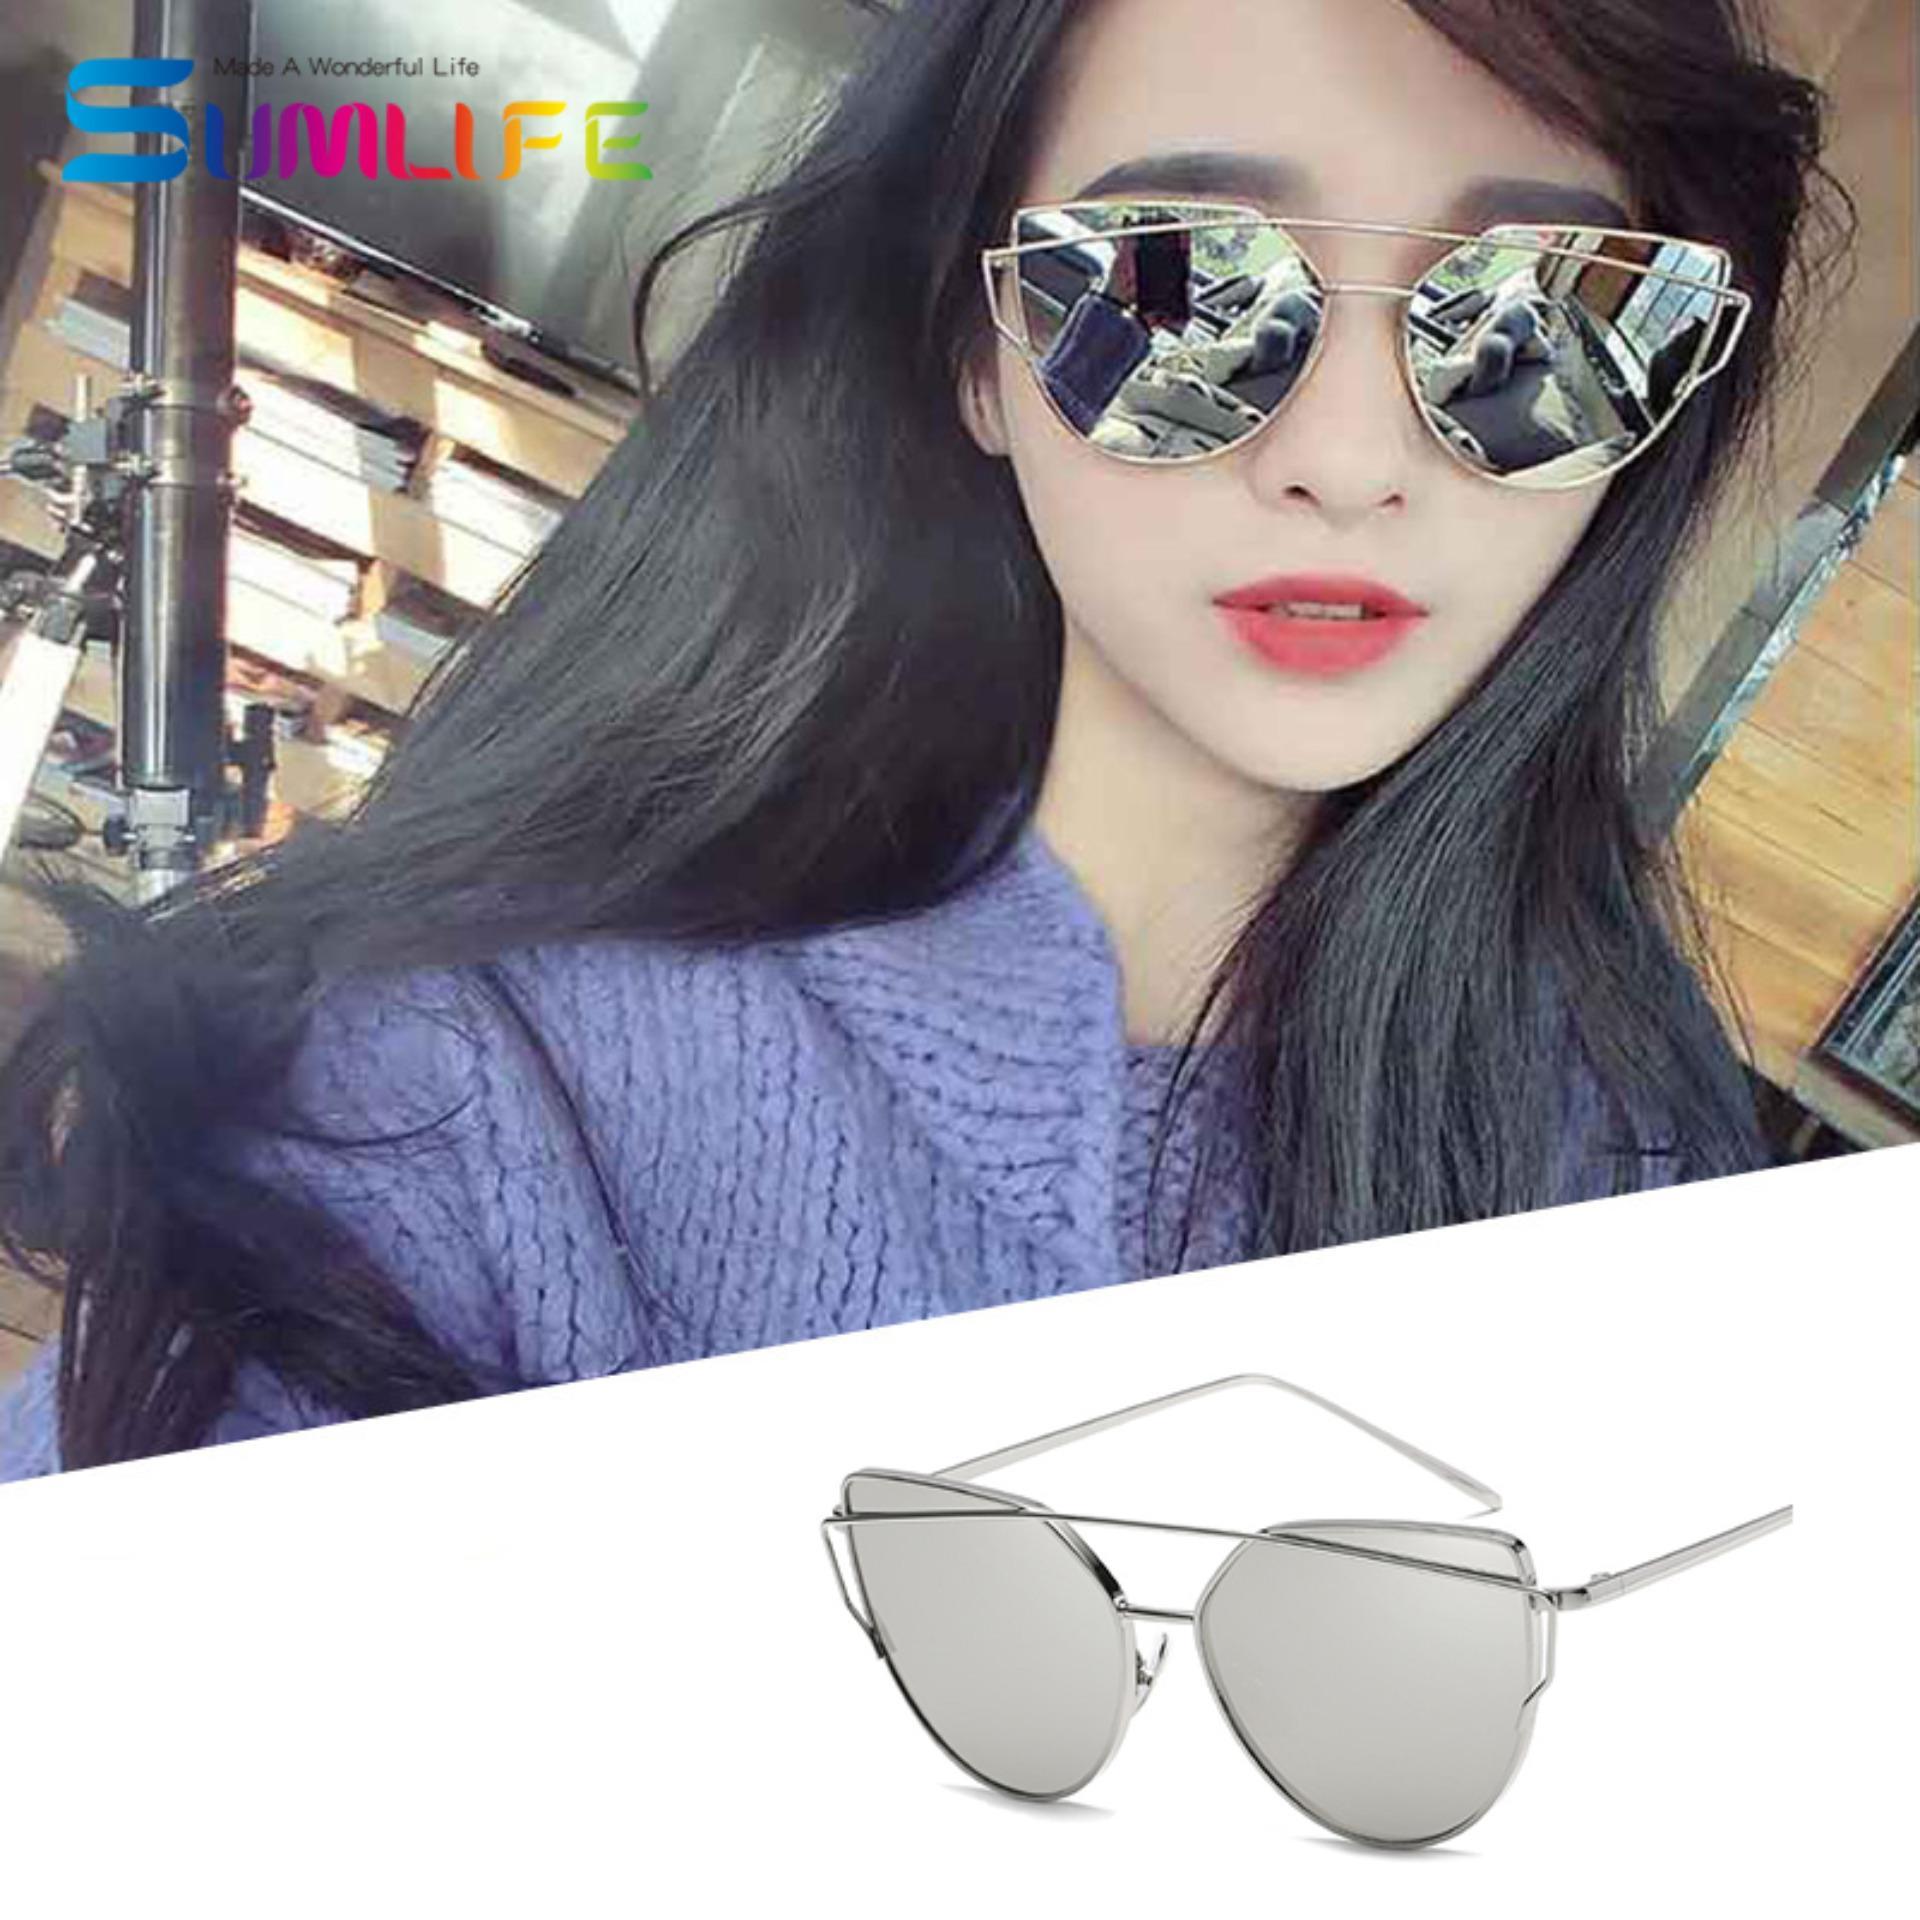 Fashion Baru Logam Warna Film Kacamata Pria dan Women Retro Style Sunglasses-Silver Frame Merkuri Putih-Intl